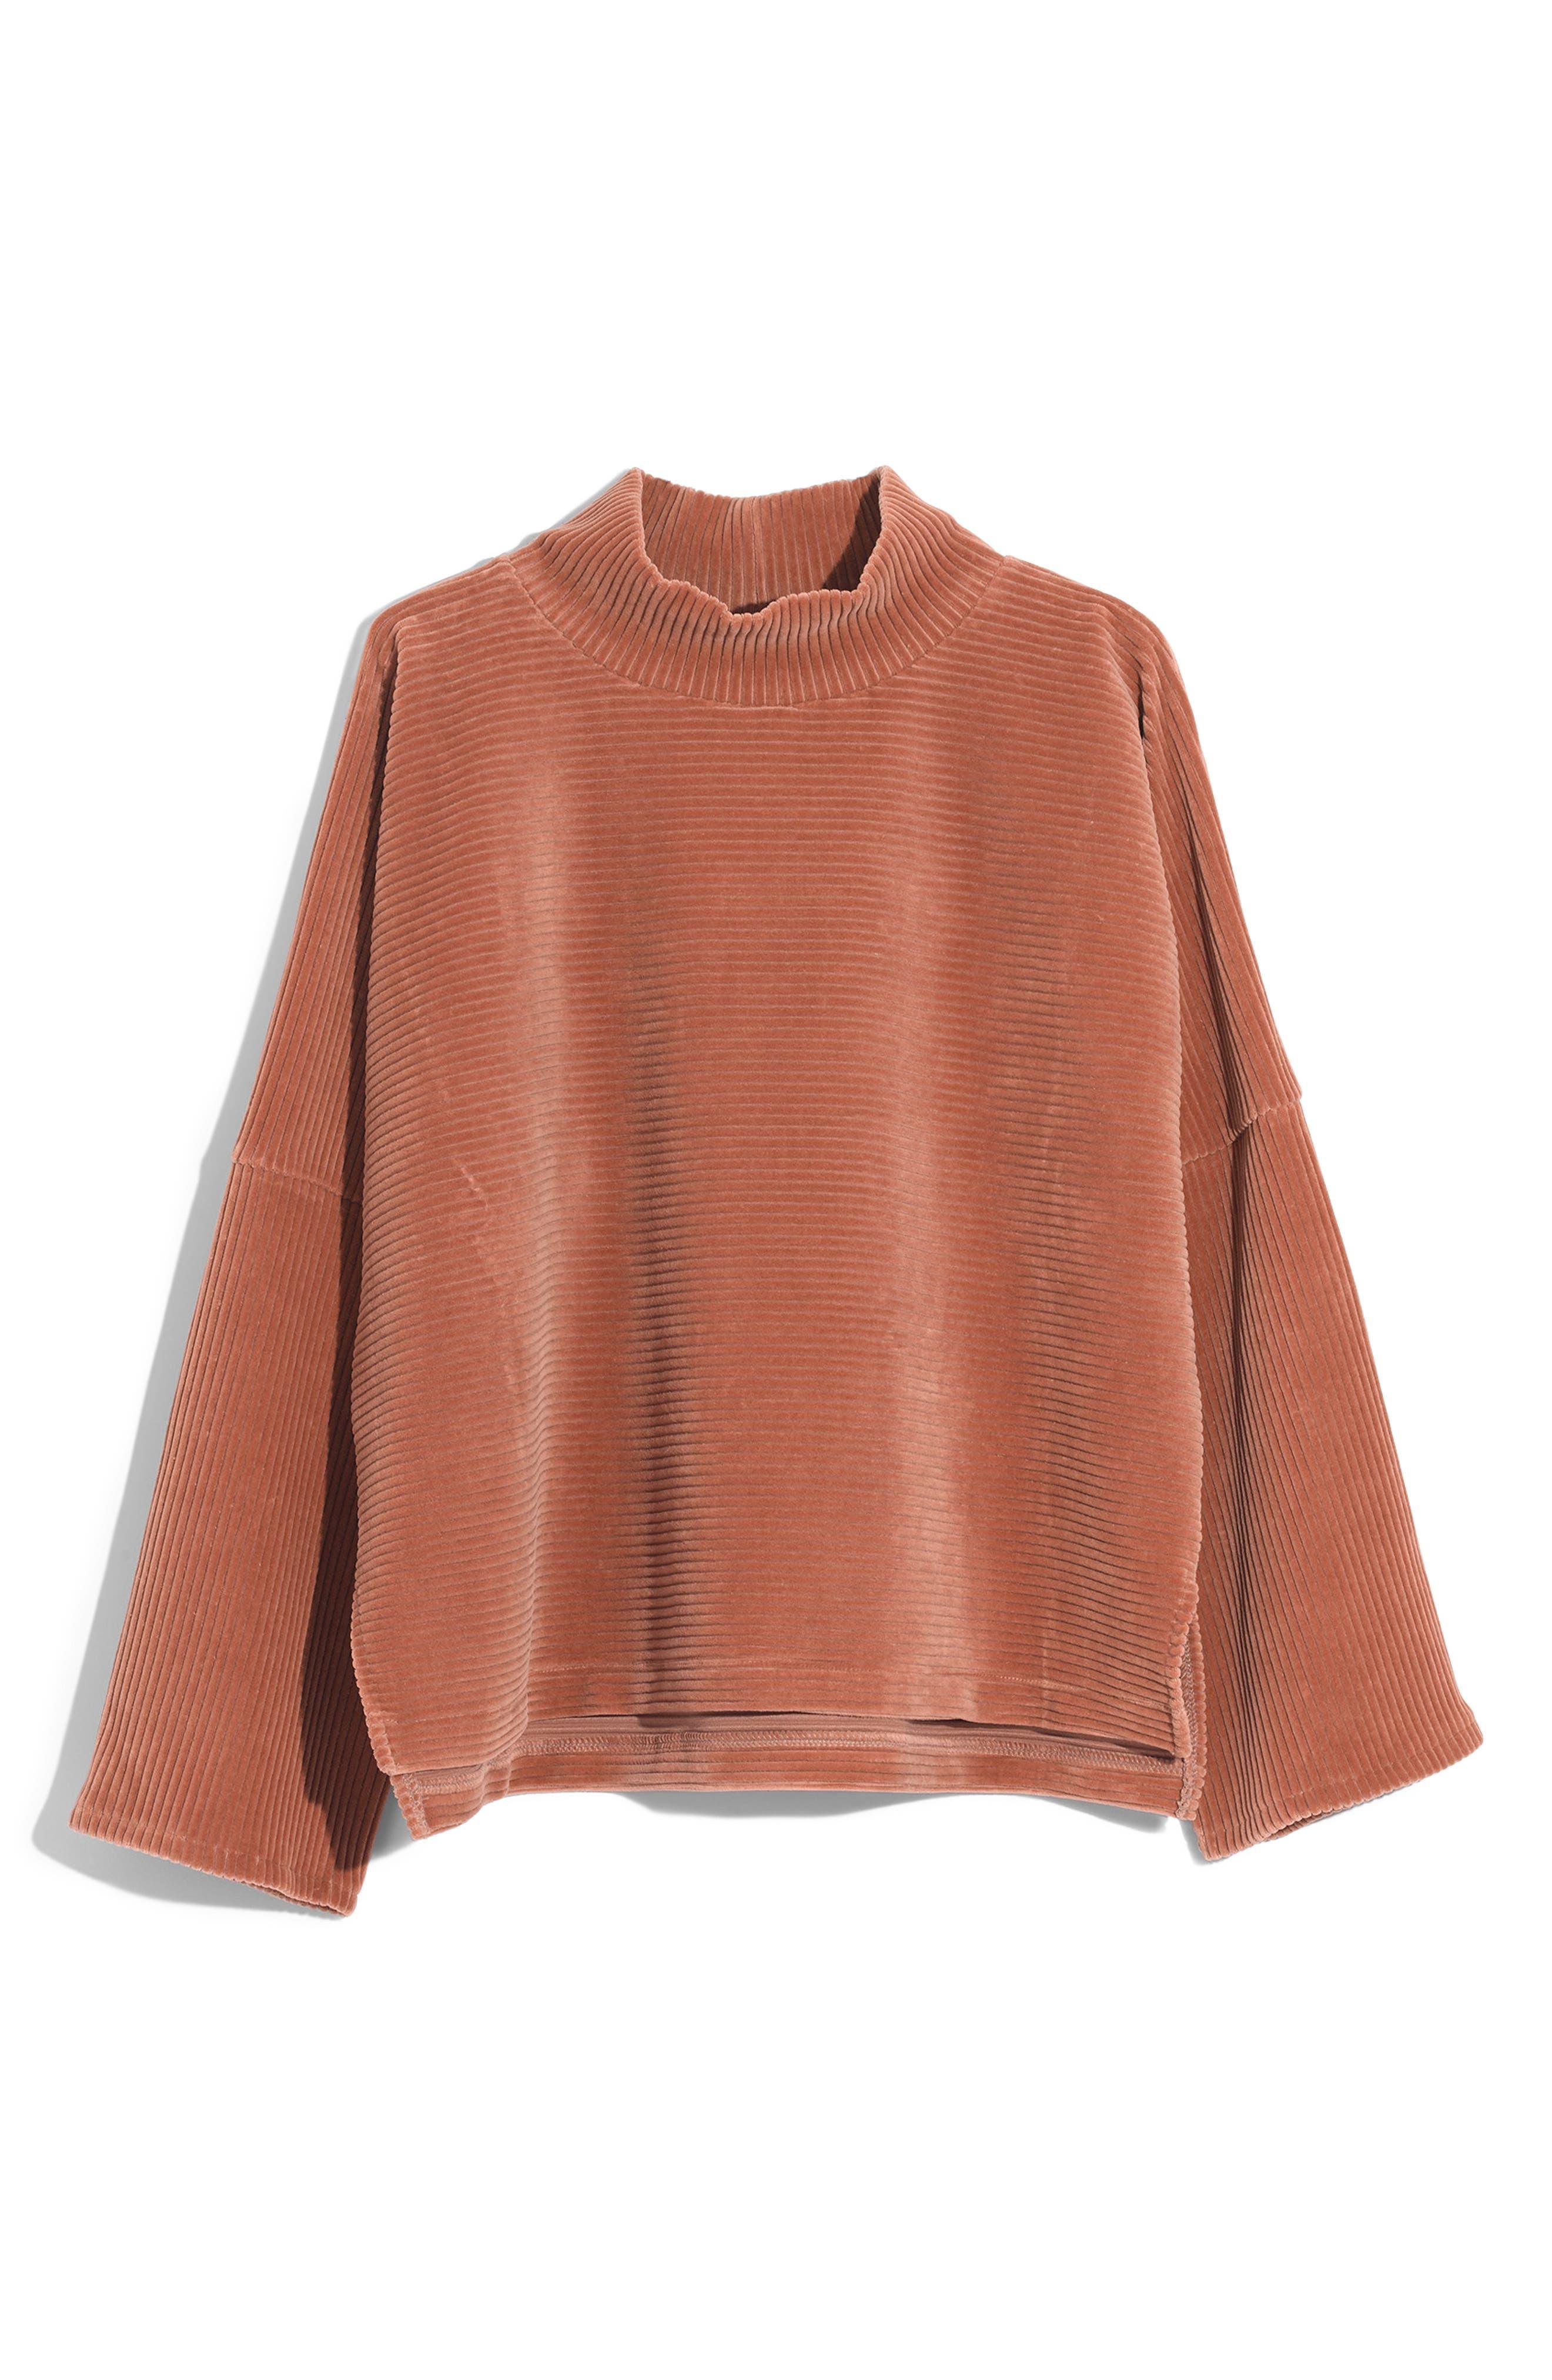 Texture & Thread Velour Corduroy Mock Neck Top,                         Main,                         color, WARM SAND